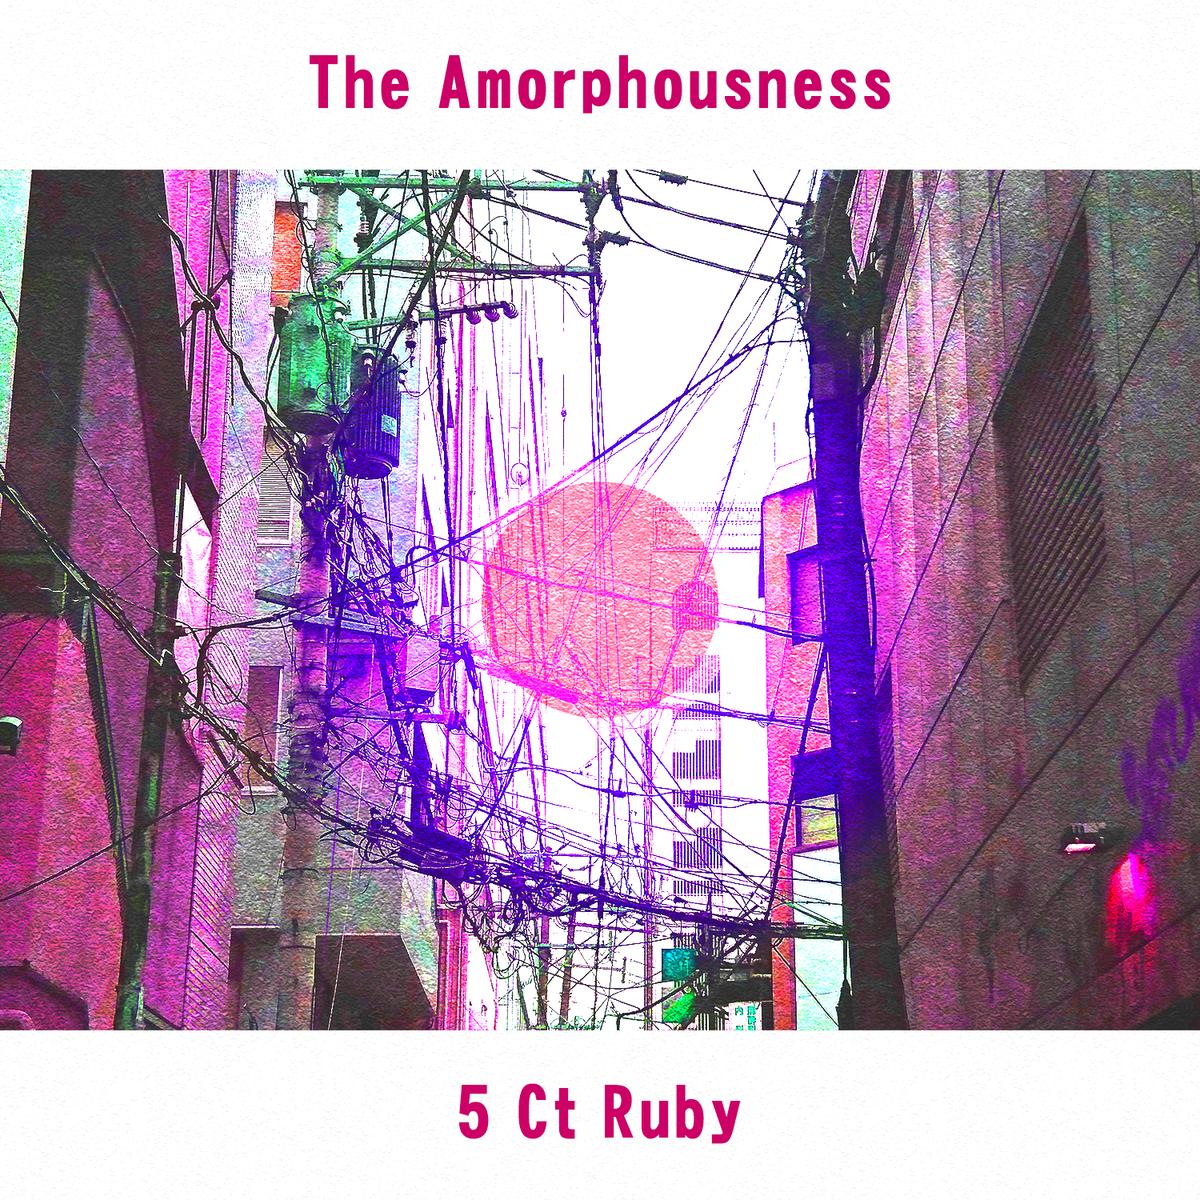 The Amorphousness - 5 Ct Ruby (Vaporwave)